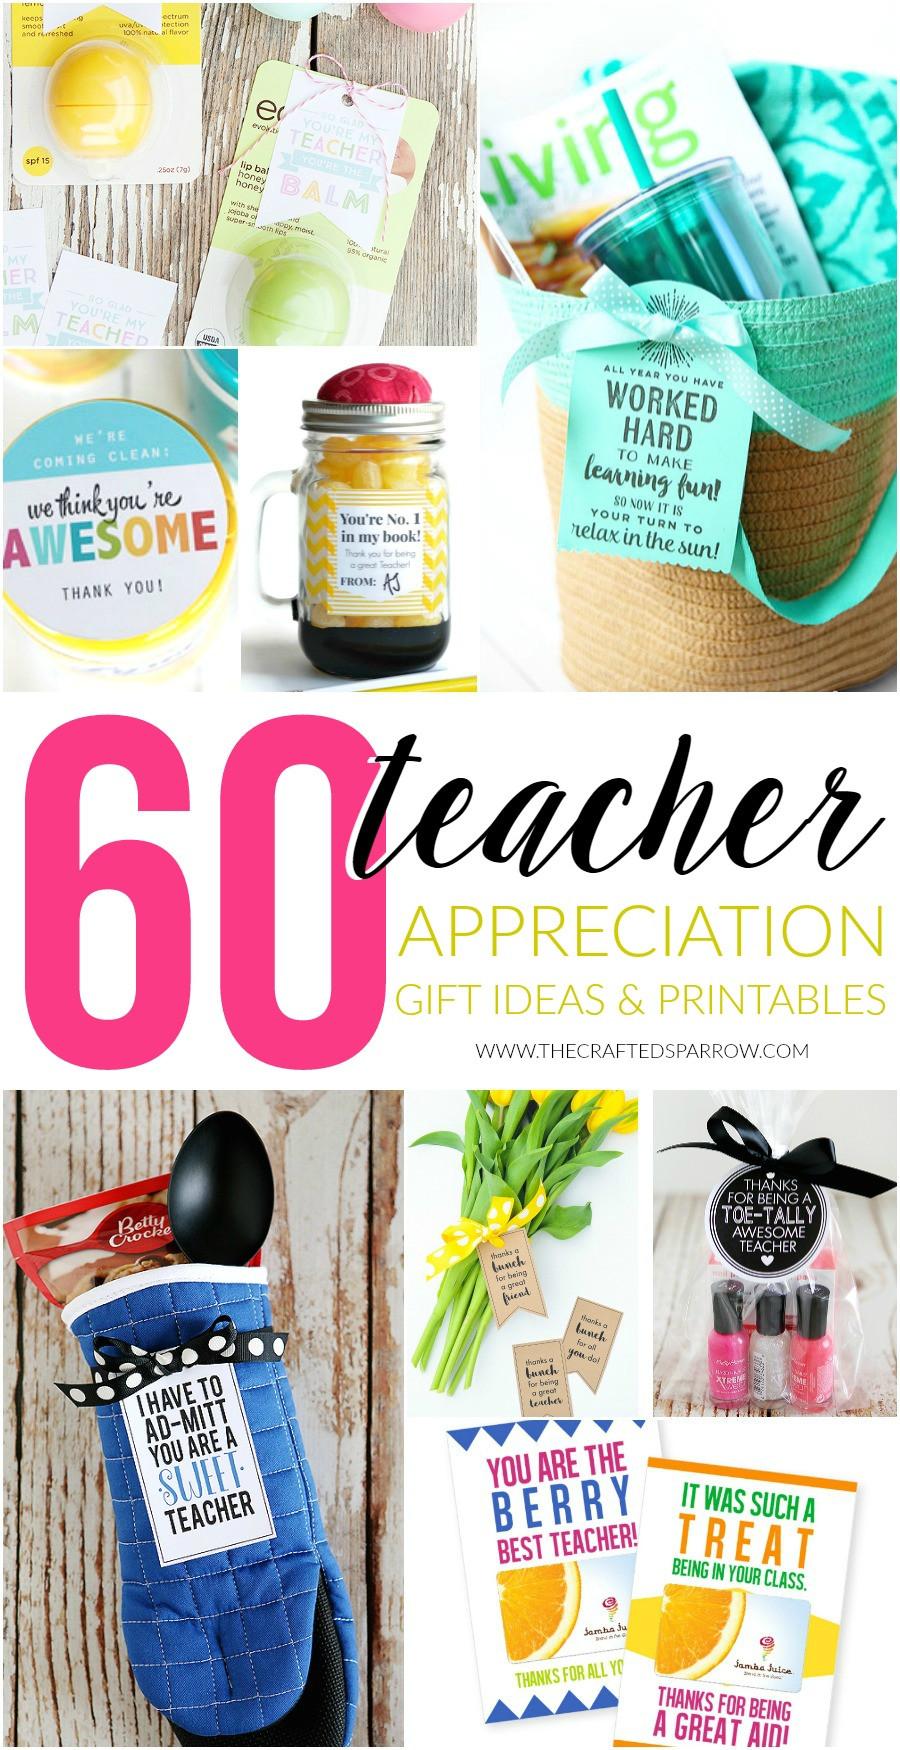 Best ideas about Teacher Appreciation Gift Ideas . Save or Pin Teacher Appreciation Lotion Gift Idea & Tags Now.